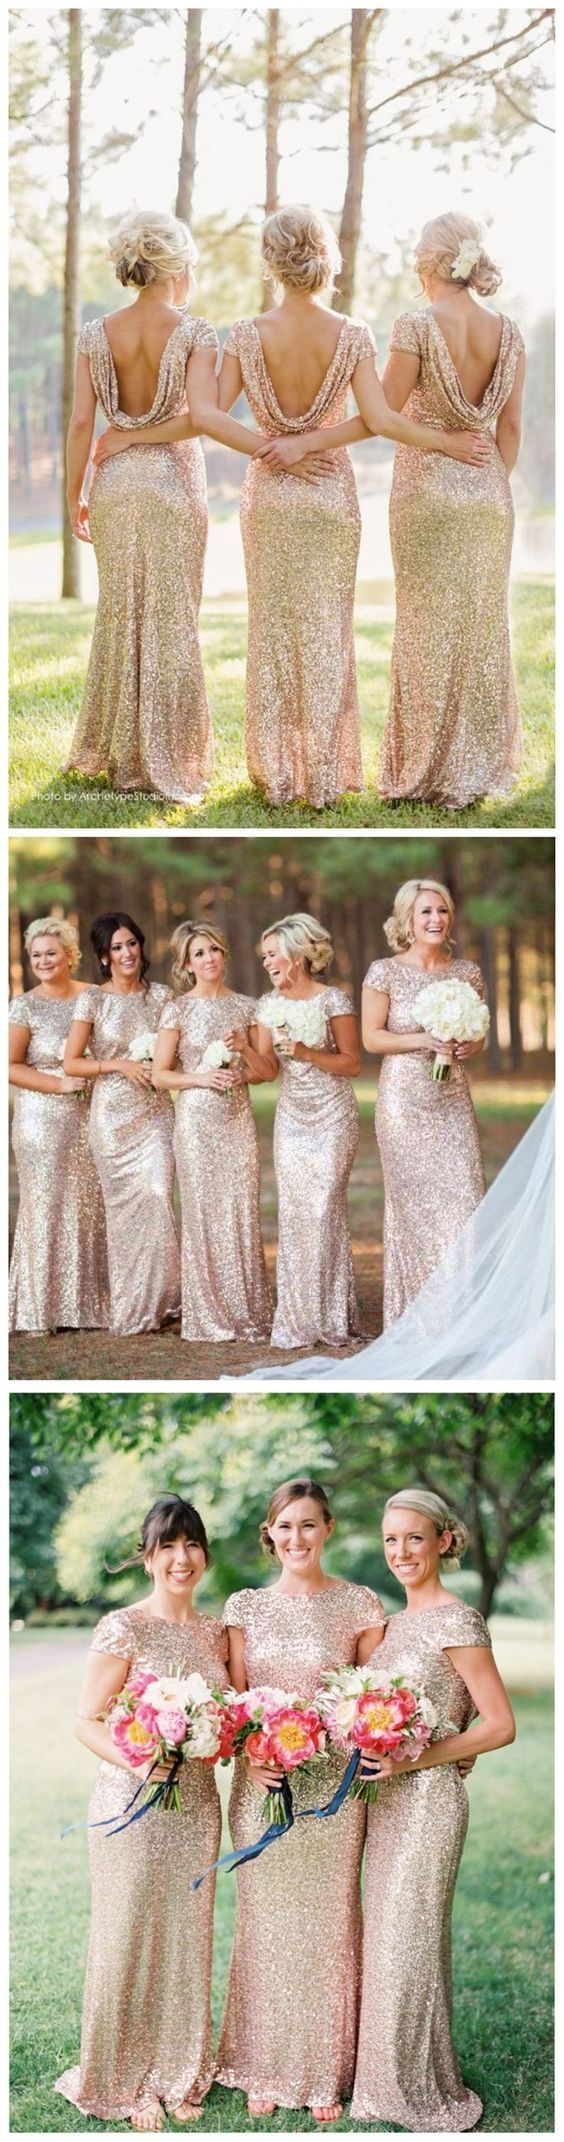 Sequin bridesmaid dress short sleeve bridesmaid dresses gold sequin bridesmaid dress short sleeve bridesmaid dresses gold bridesmaid dresses long bridesmaid dresses ombrellifo Choice Image